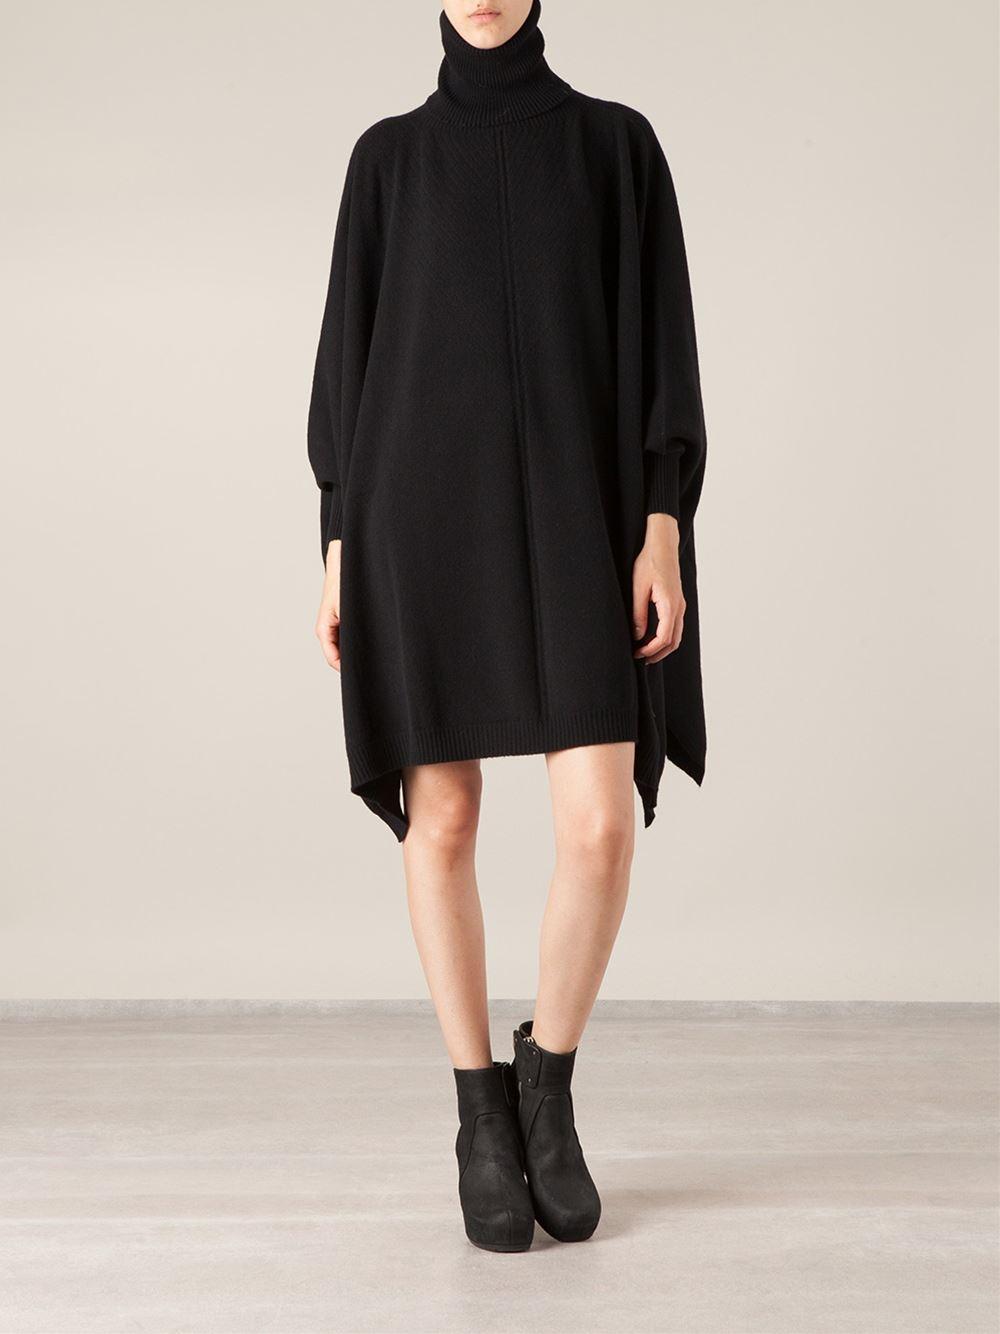 Lamberto losani Oversized Sweater Dress in Black | Lyst